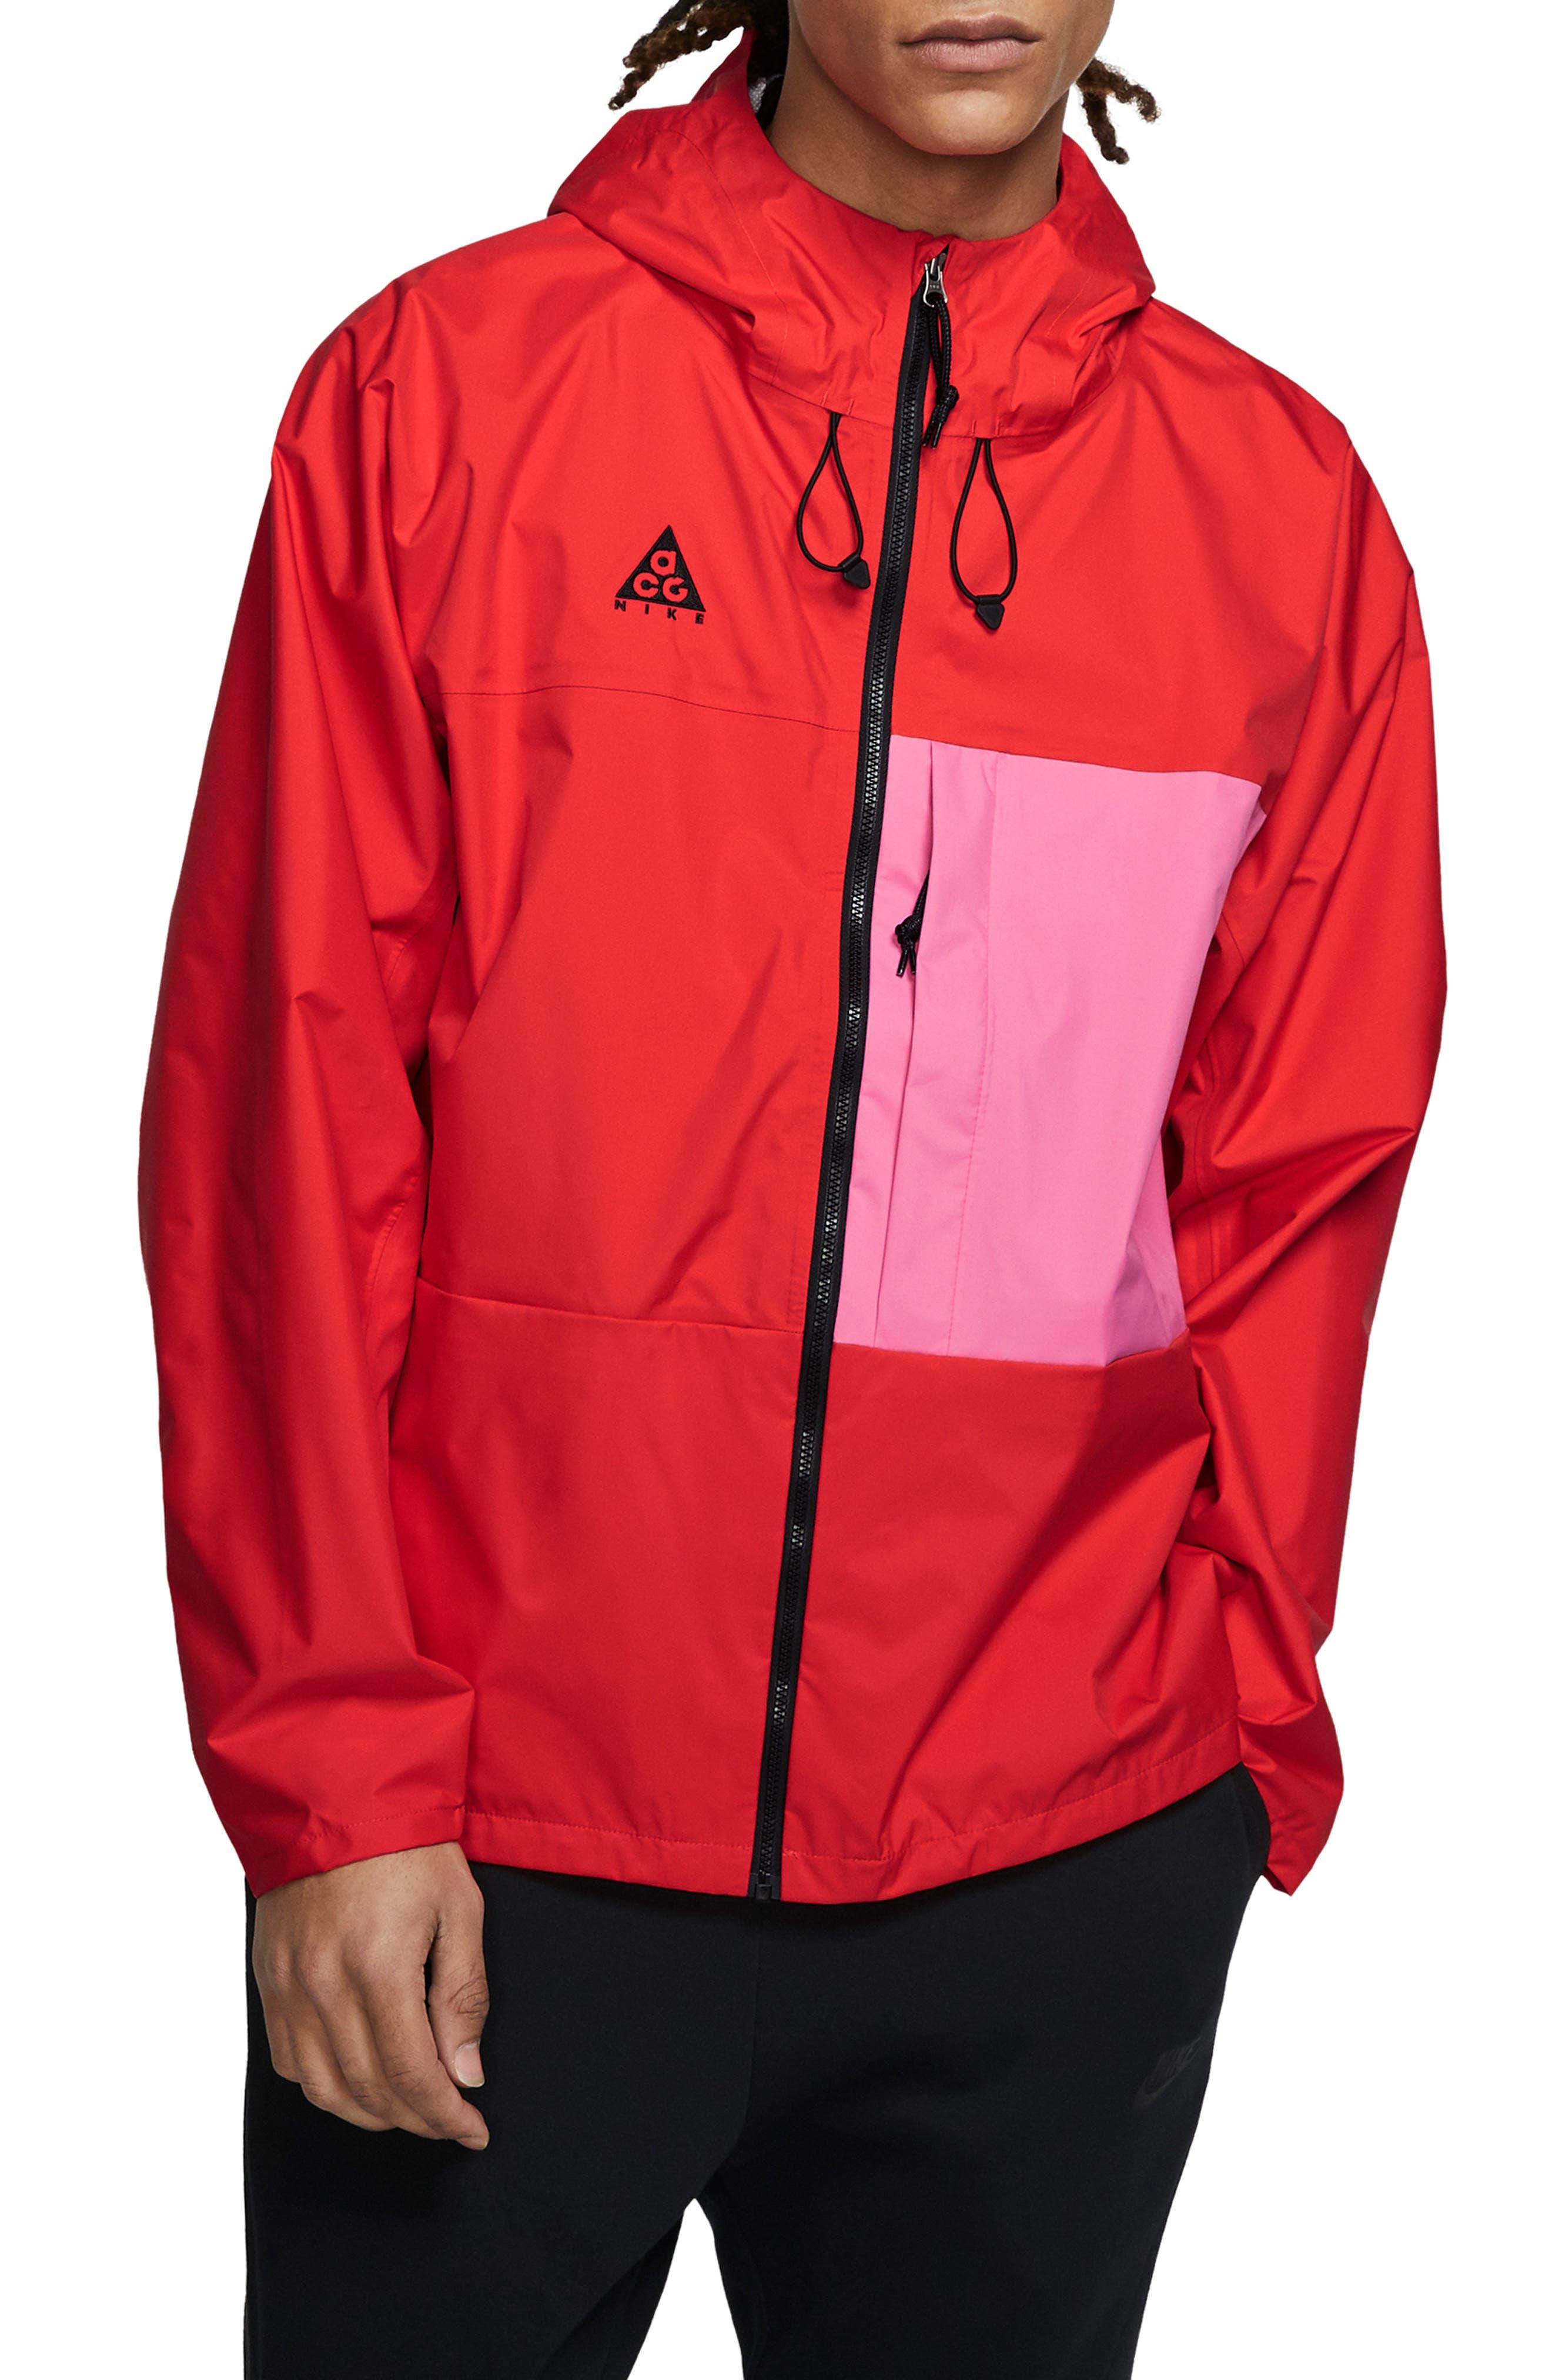 Nike Acg Packable Jacket, Red